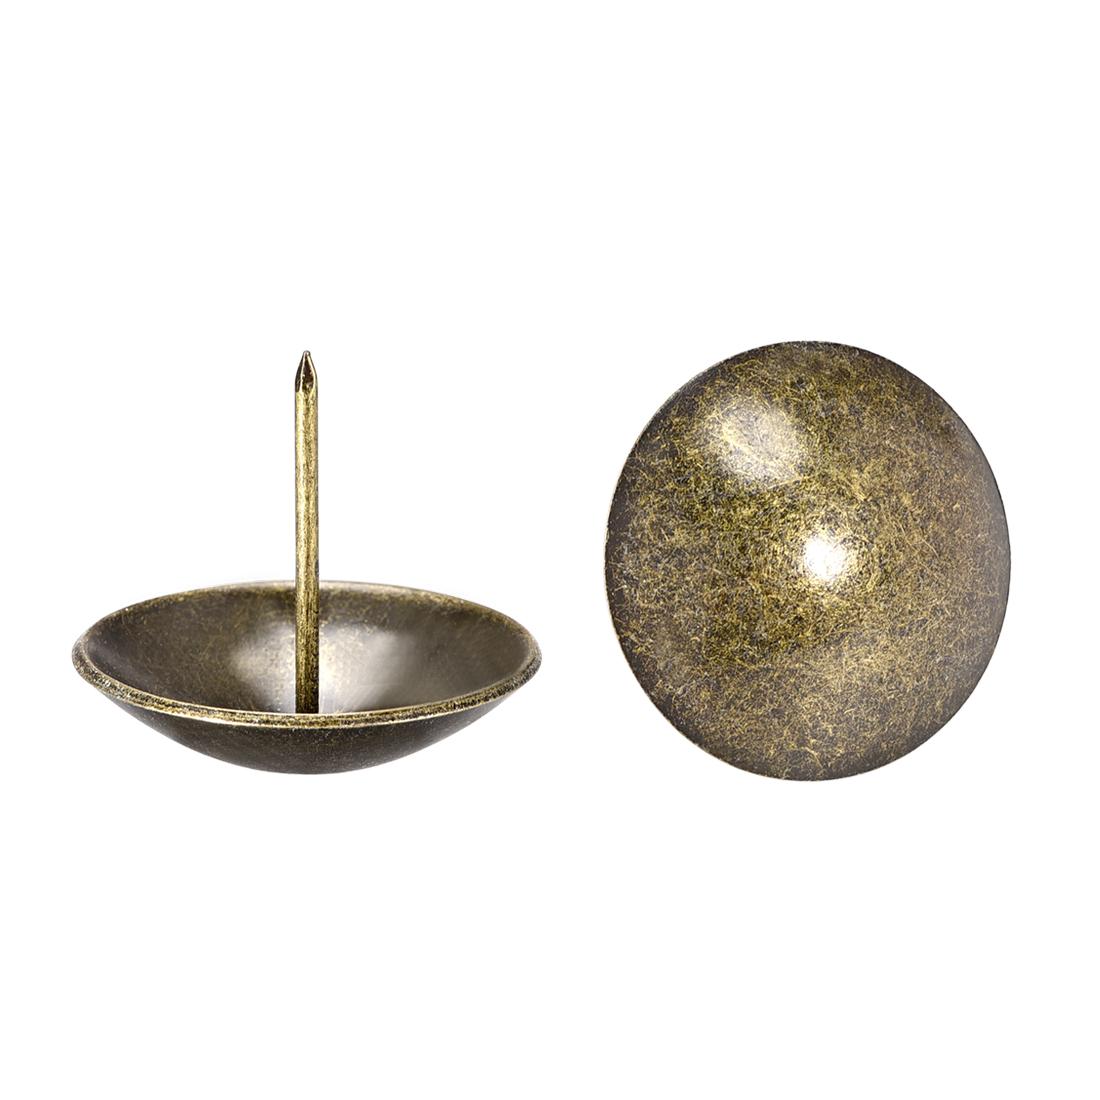 Upholstery Nails Tacks 40mm Dia 37mm Height Round Push Pins Bronze Tone 10 Pcs